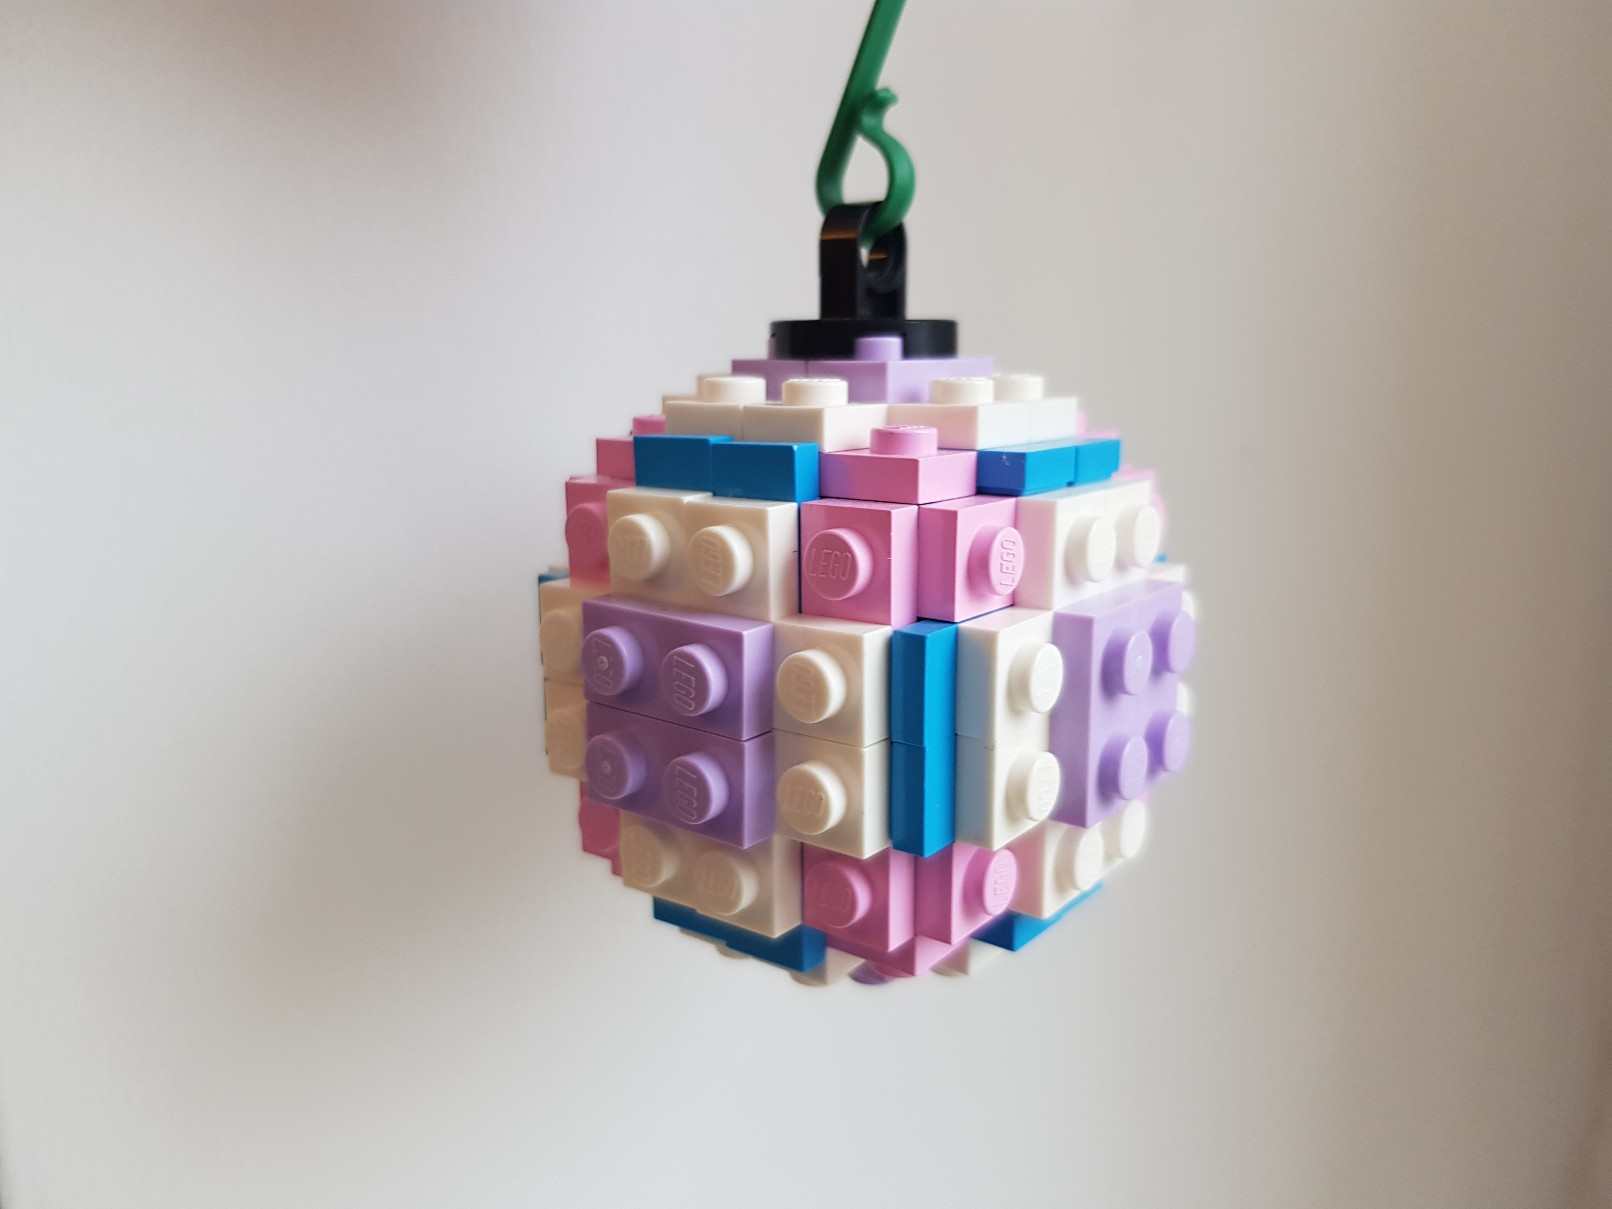 lego moc christmas baubles ornament frozen pink magenta 2